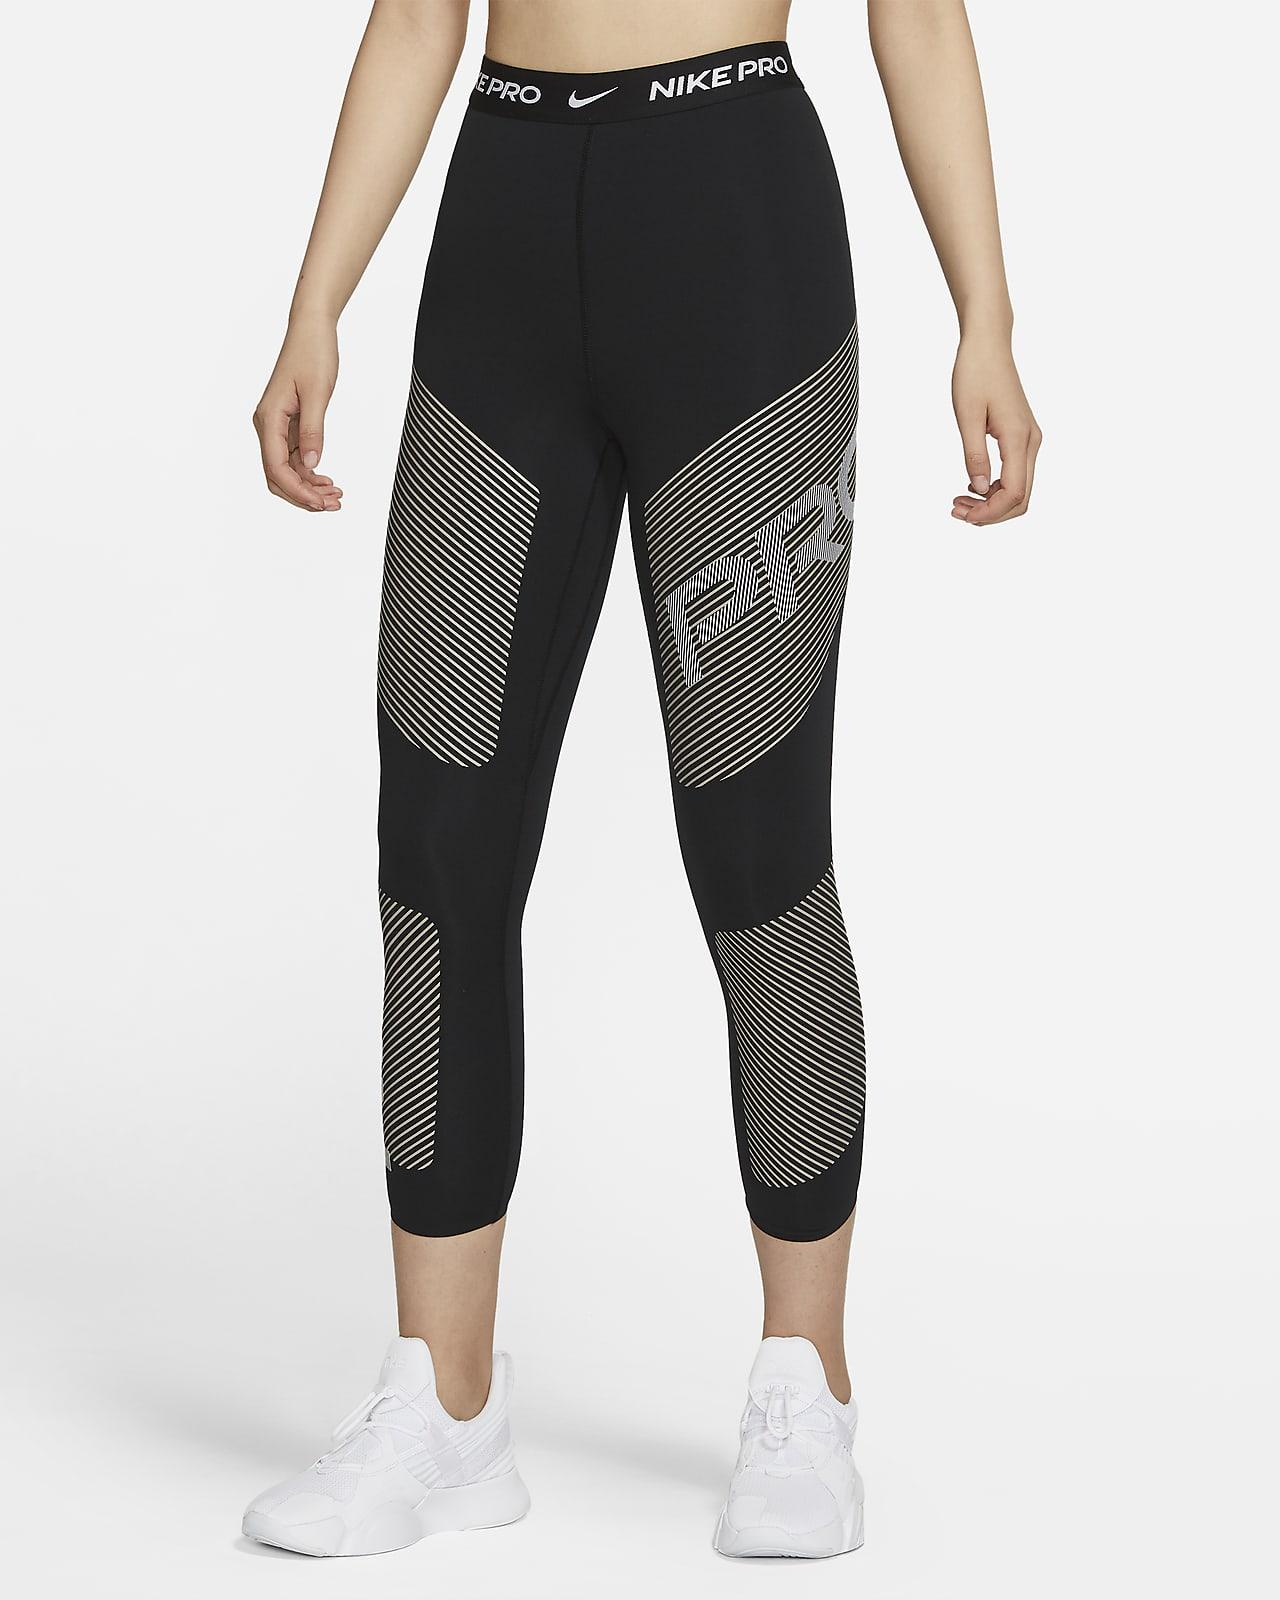 Nike Pro Dri-FIT 女款高腰圖樣九分內搭褲